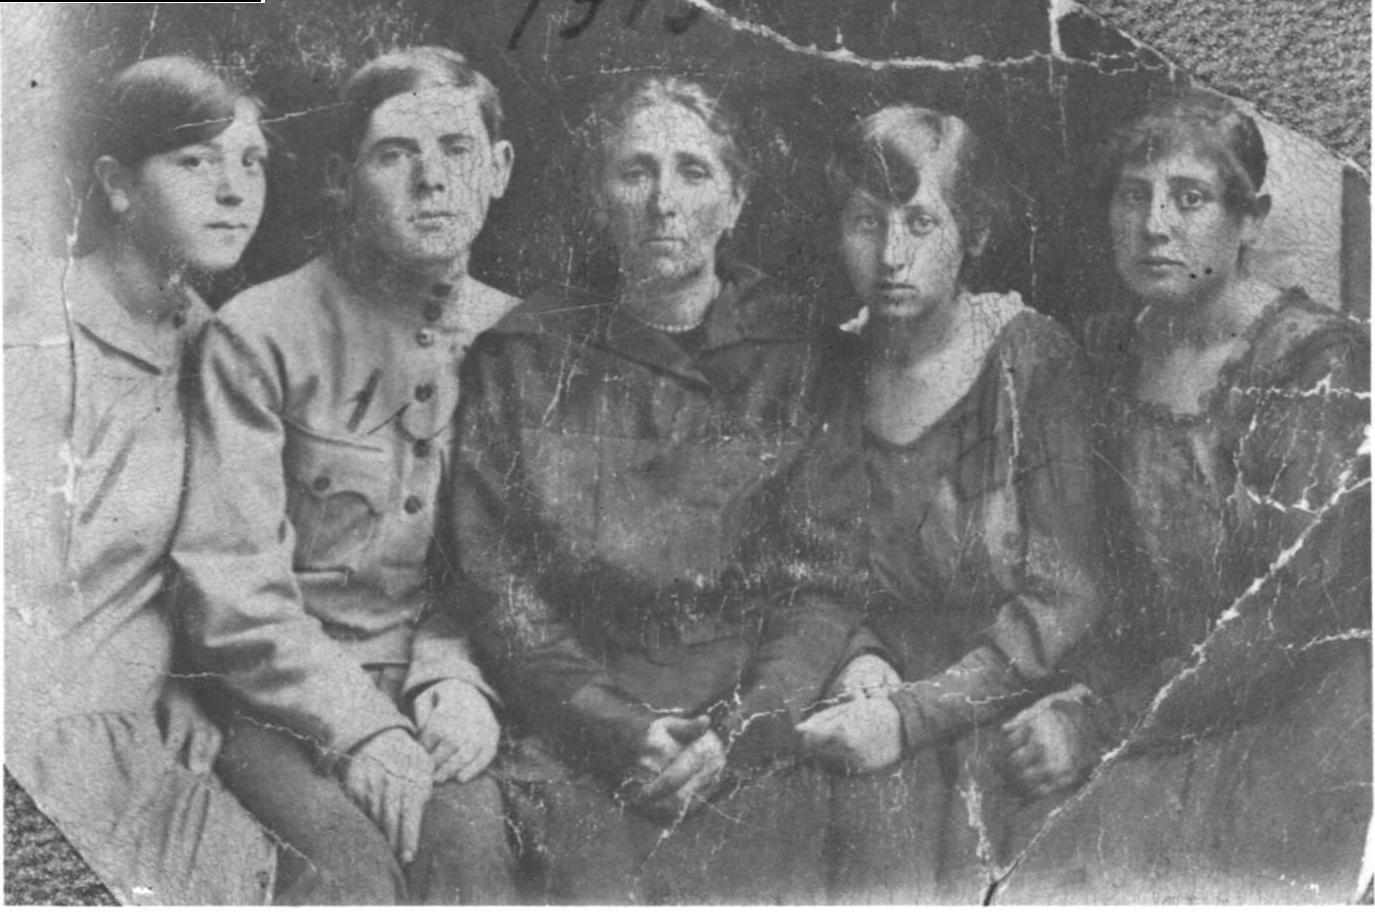 From left to right: Minnie (Masia) Feinstein (nee Schmais, Louis (Layzer) Schmais, Becky (Nakhoma) Schmais (nee Feinstein), Ray (Rifke) Feldman (nee Schmais), Esther (Ester) Blatt (nee Schmais).